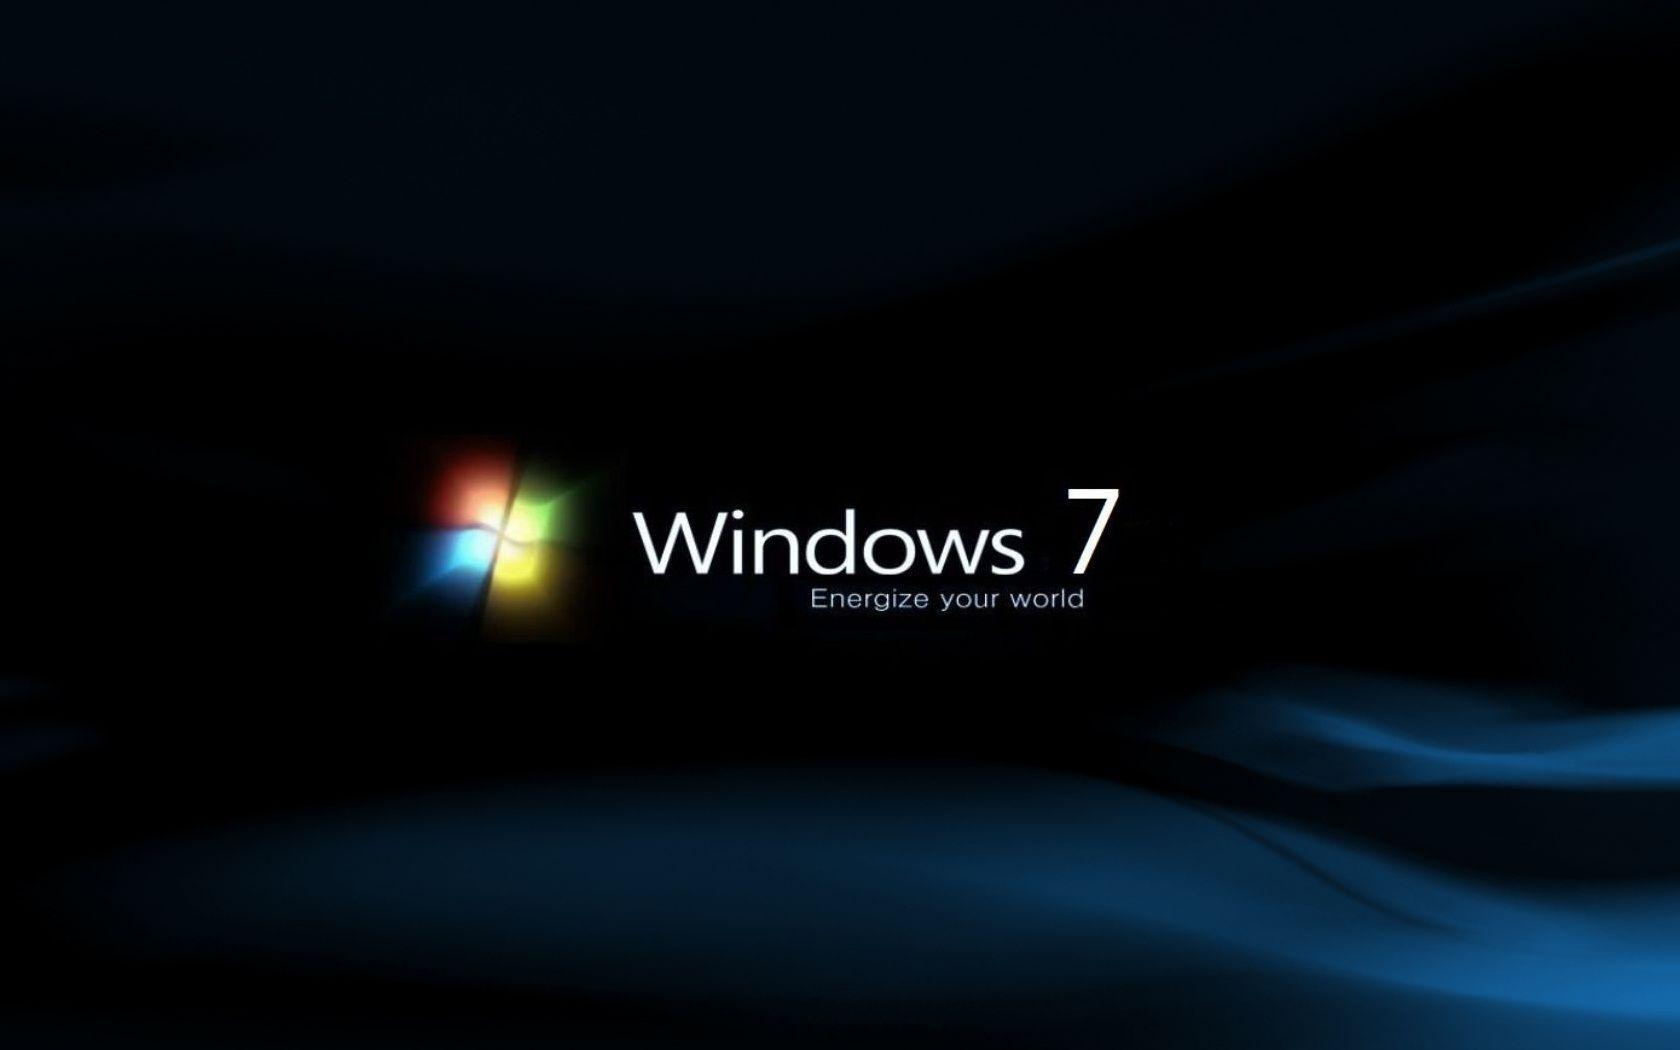 Desktop Background Black Windows 7